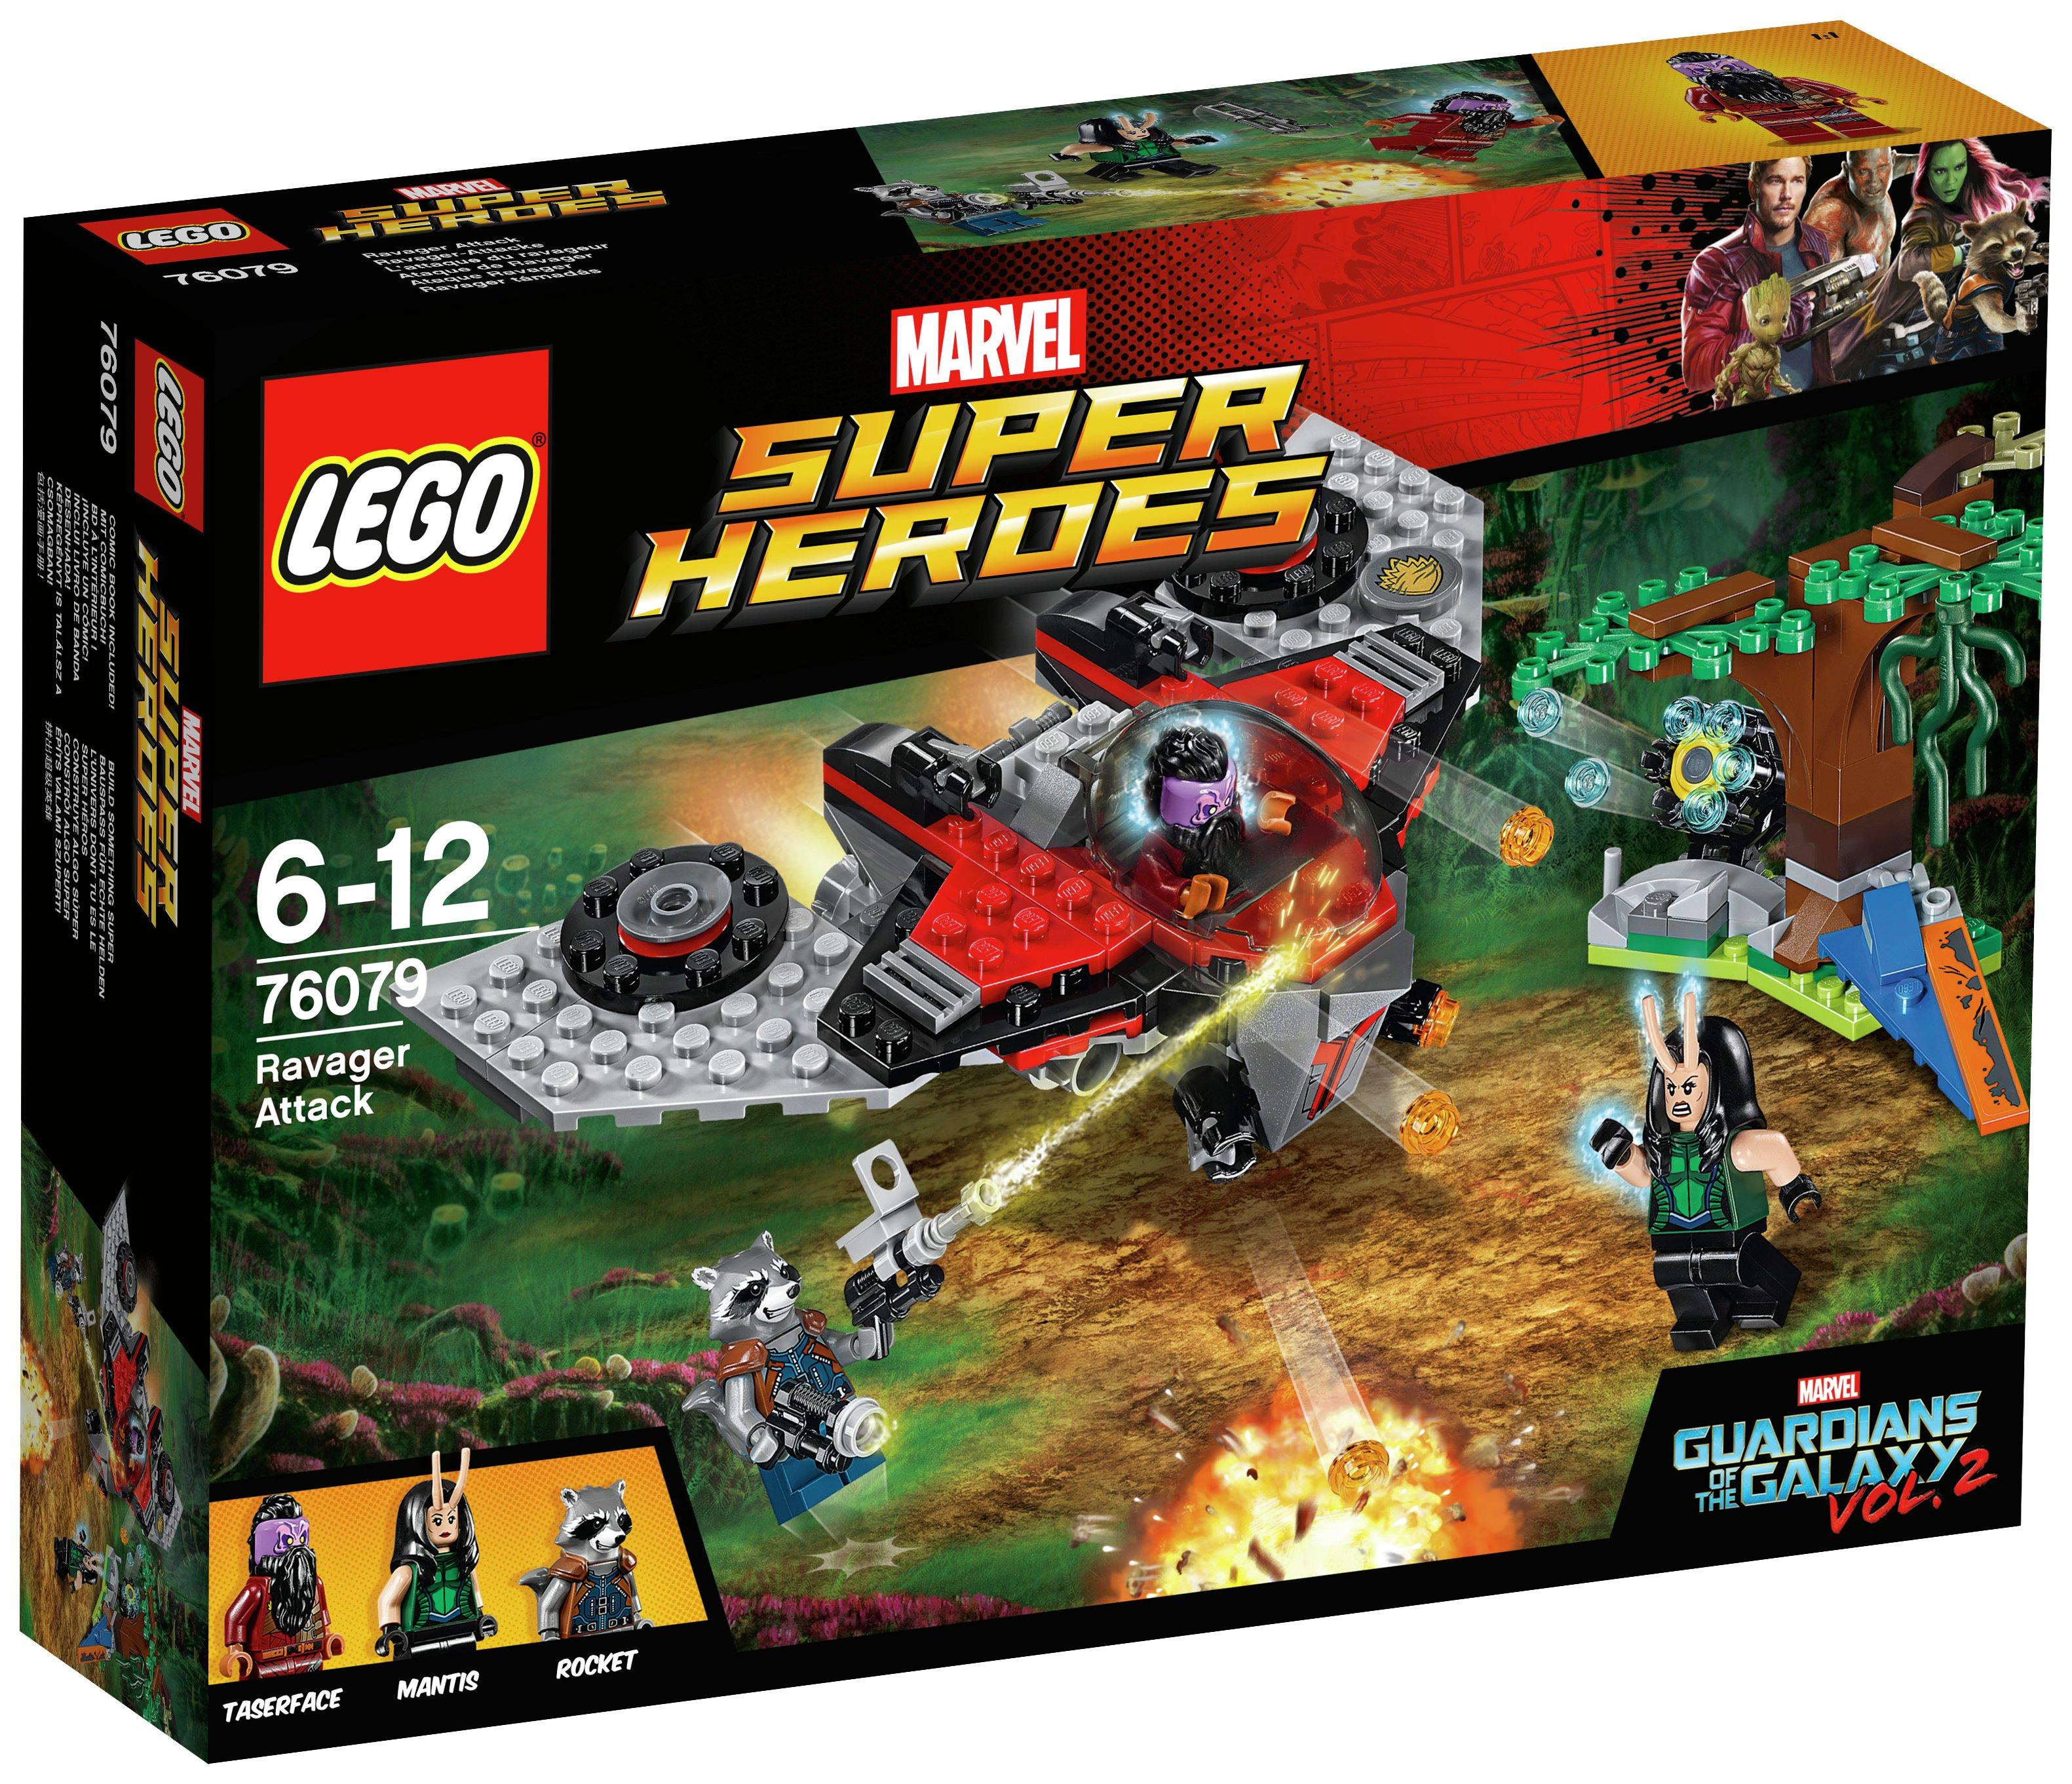 LEGO Marvel Super Heroes Ravager Attack - 76079